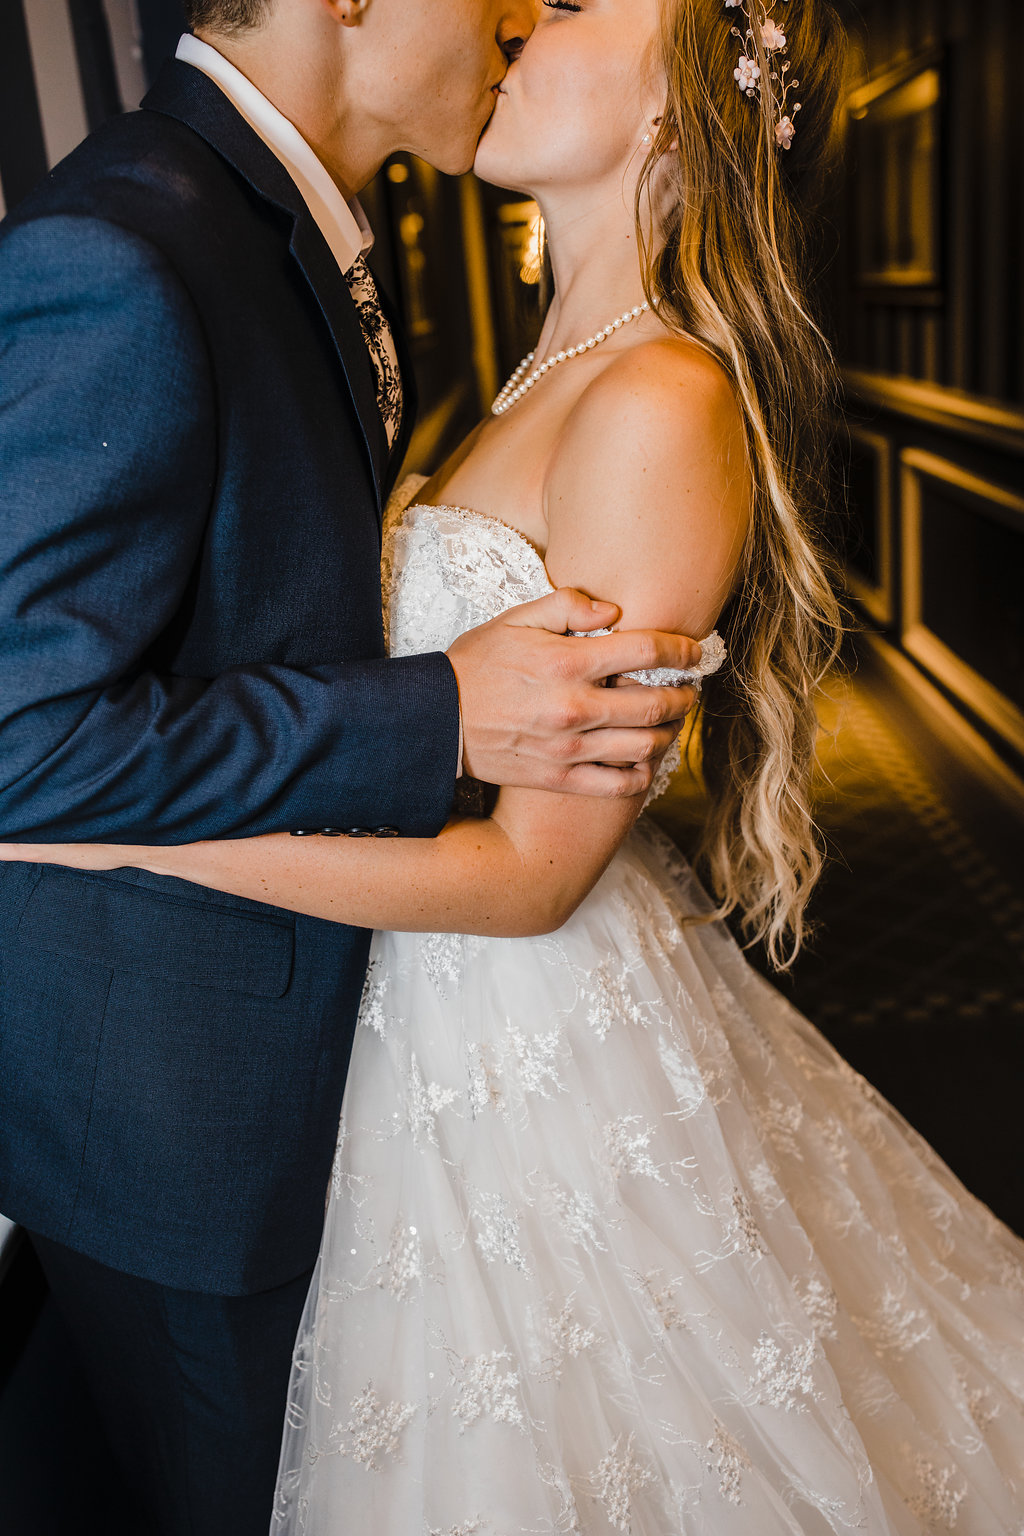 bride and groom details at wedding reception pearl bridal necklace los angeles california wedding photography